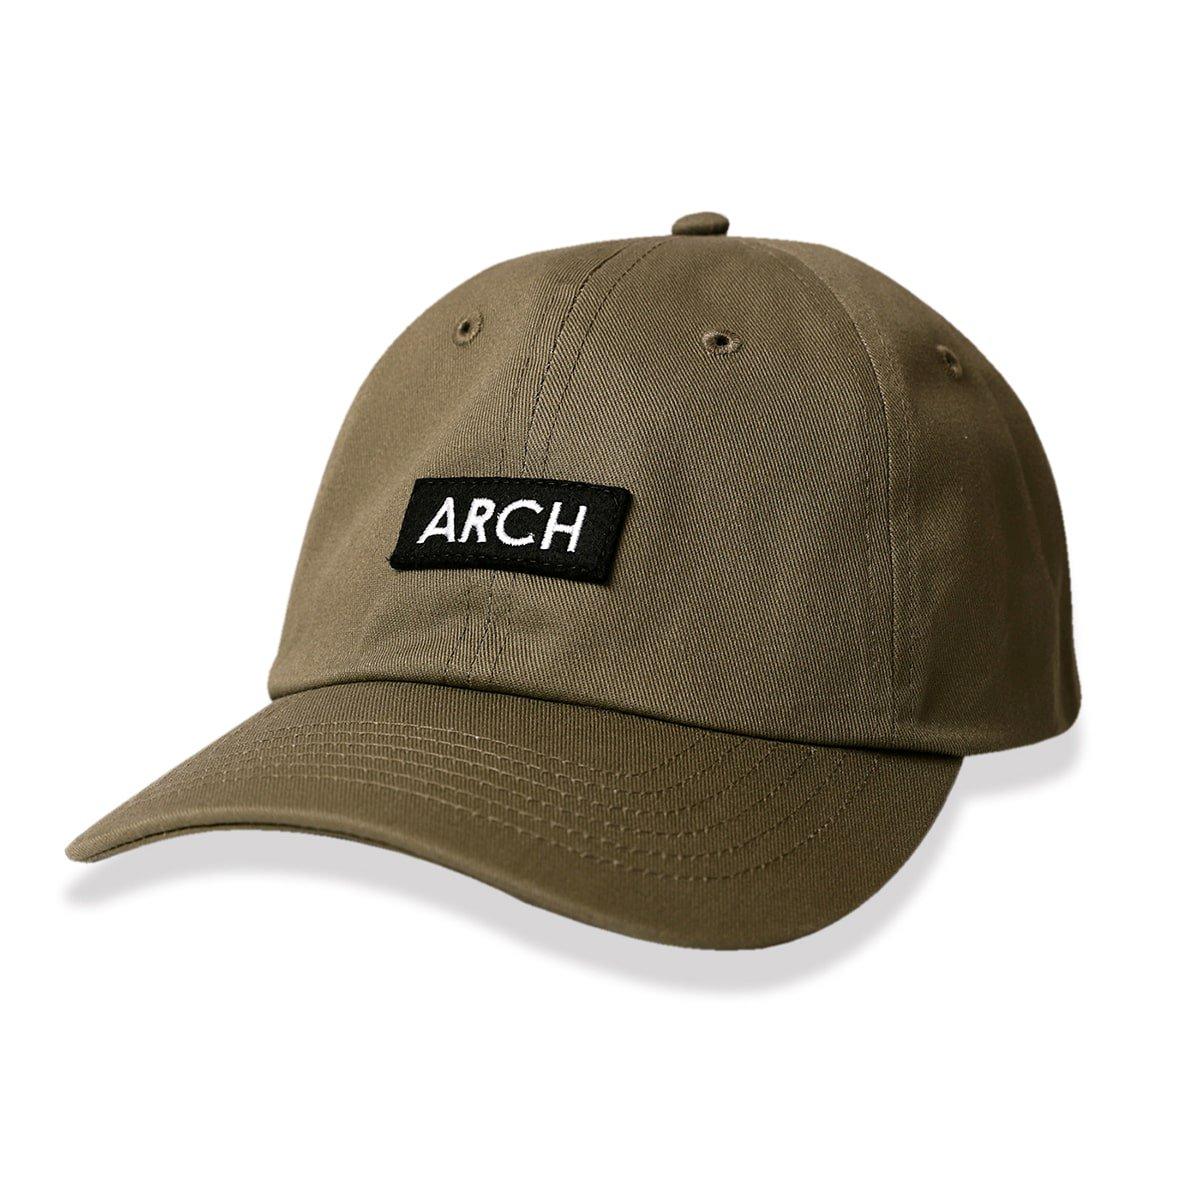 patch twill cap【khaki】